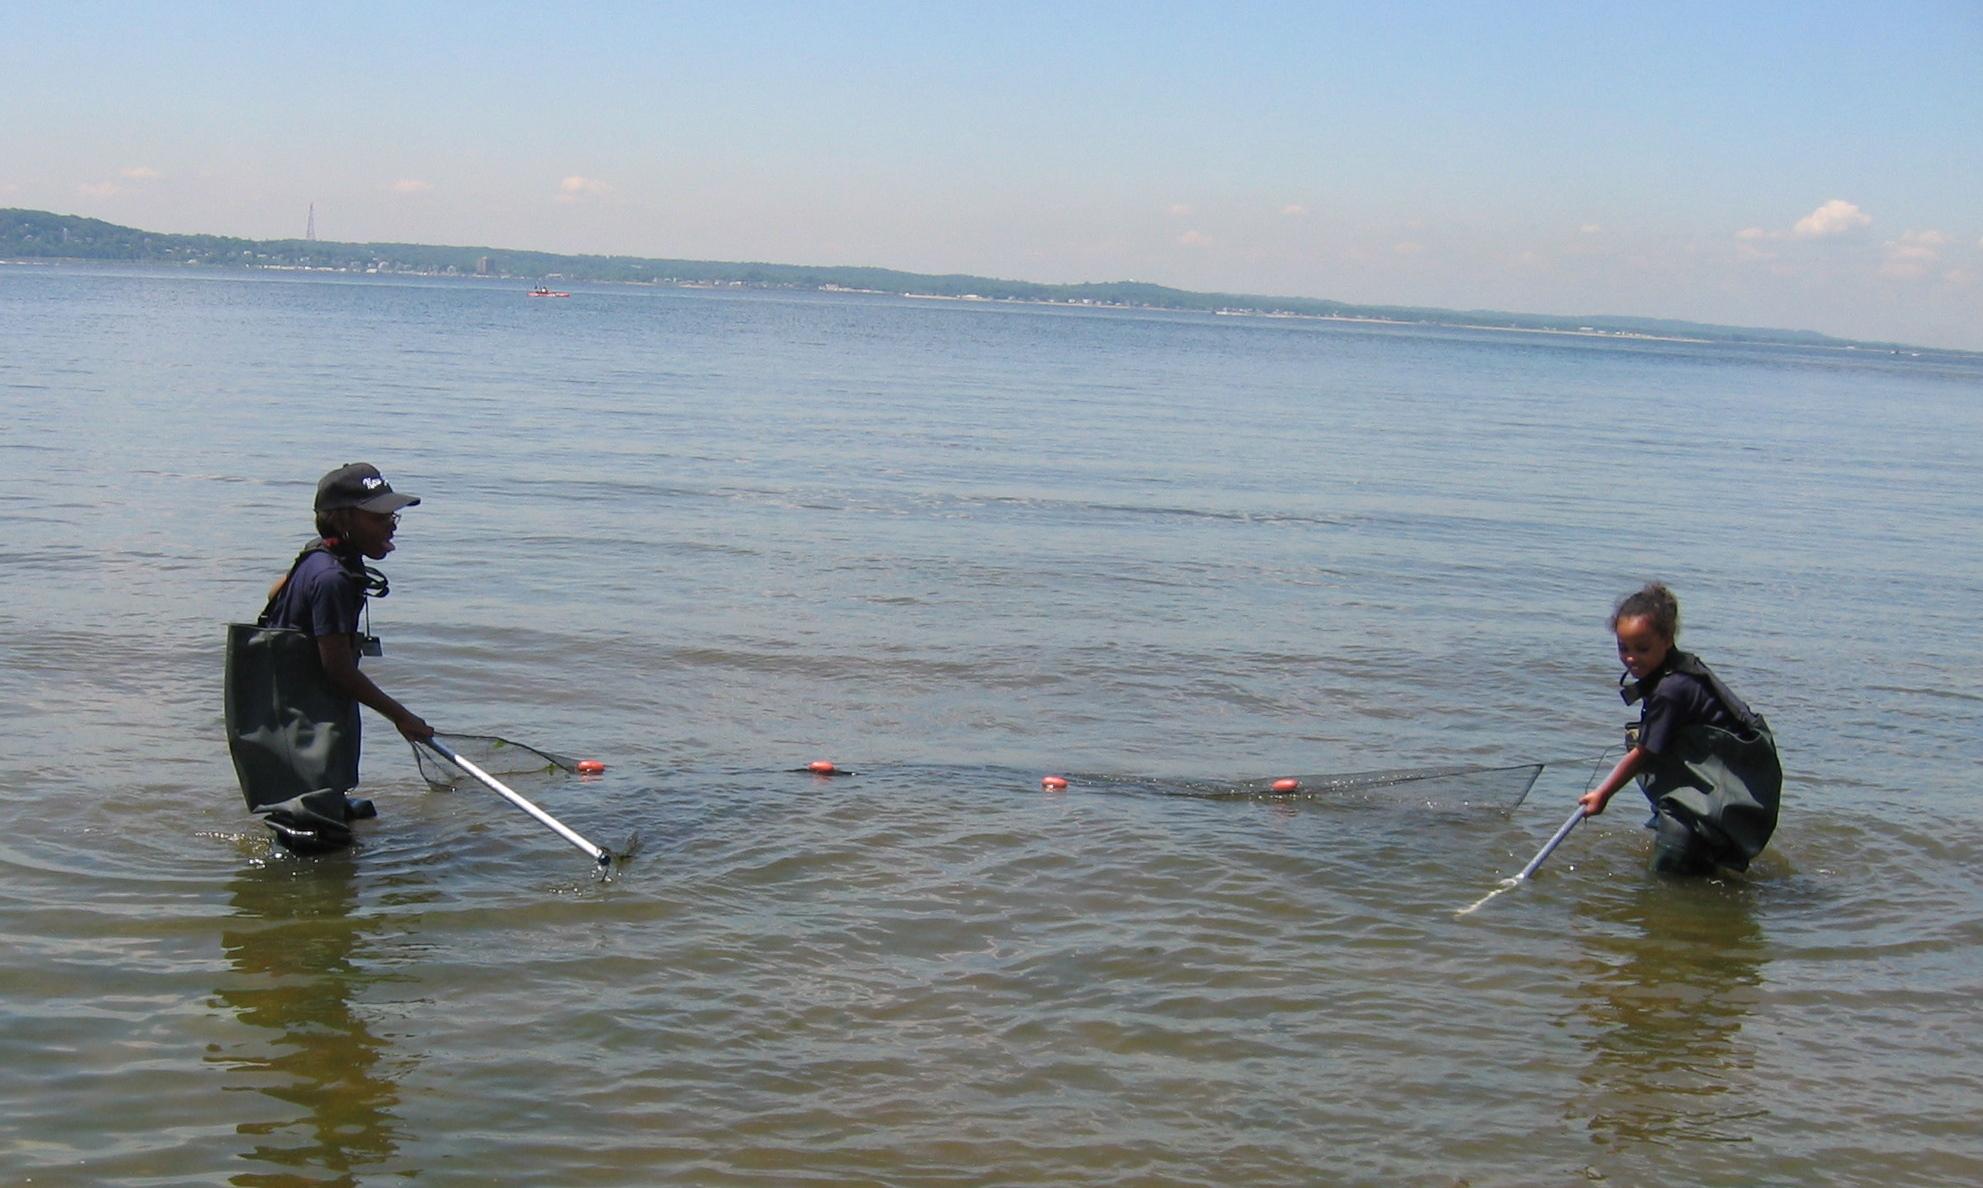 Field trips in nj nature and science field trips in nj for Kids fishing nets